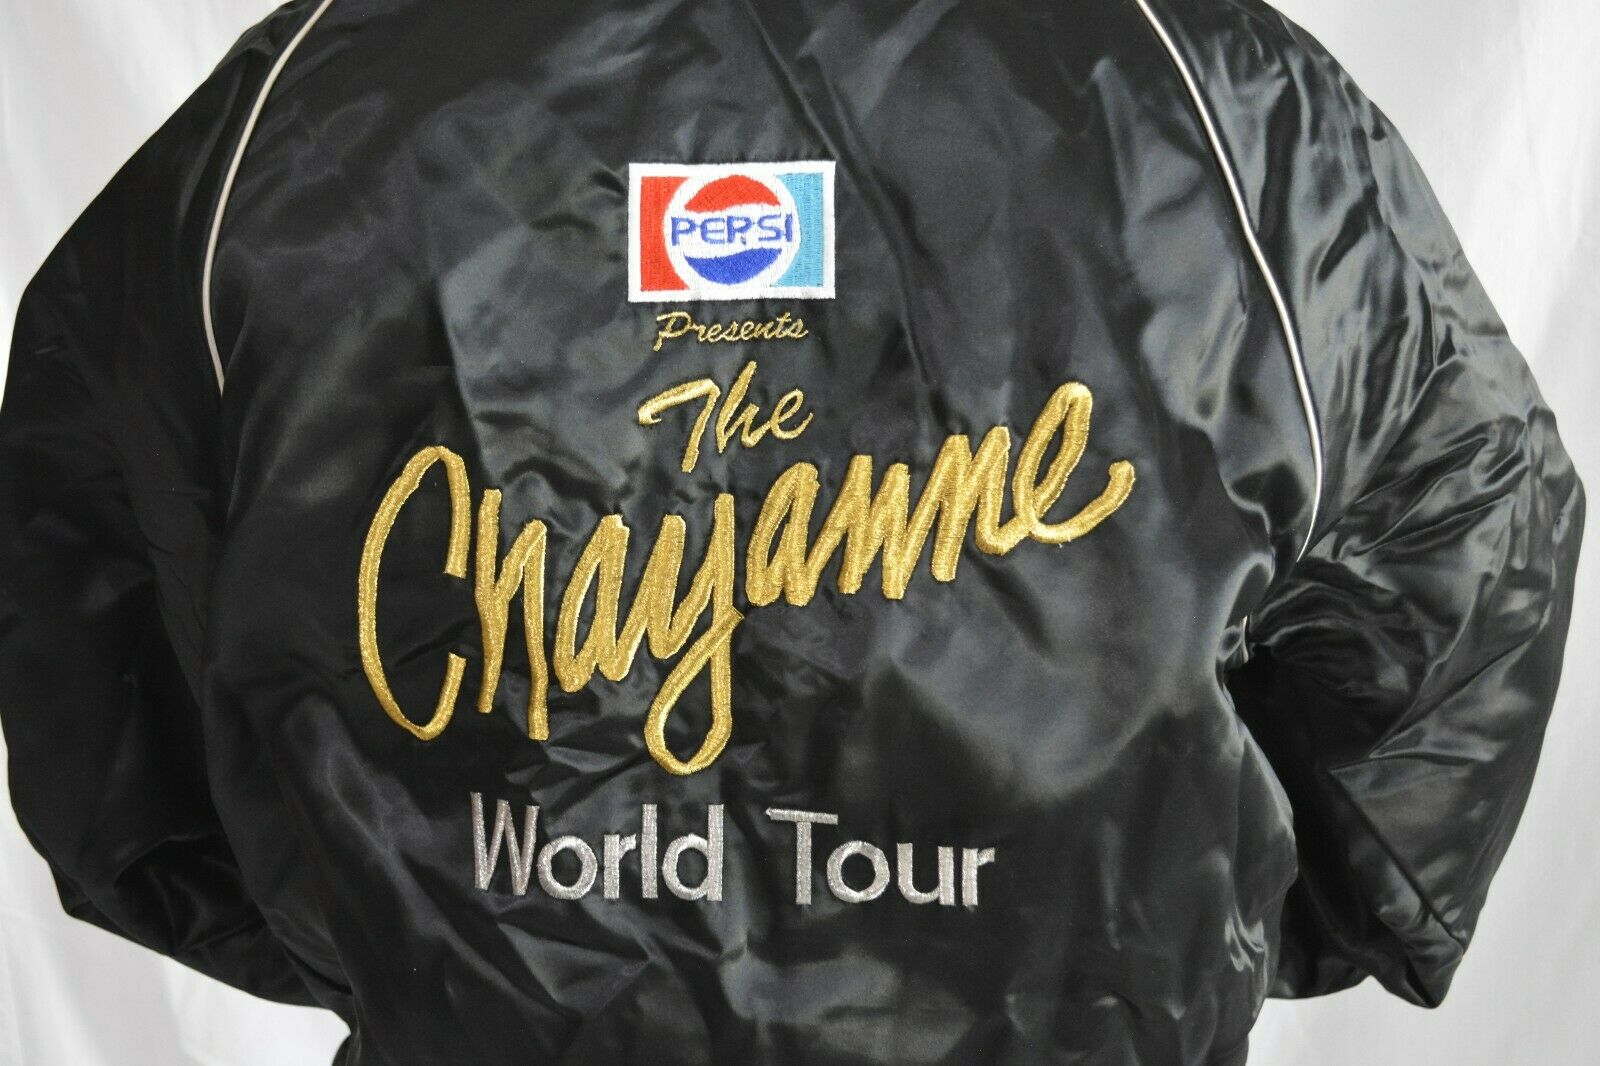 Vintage Chayanne Black Satin Embroidered Tour Jacket M Pepsi Latino Identity  - $199.99